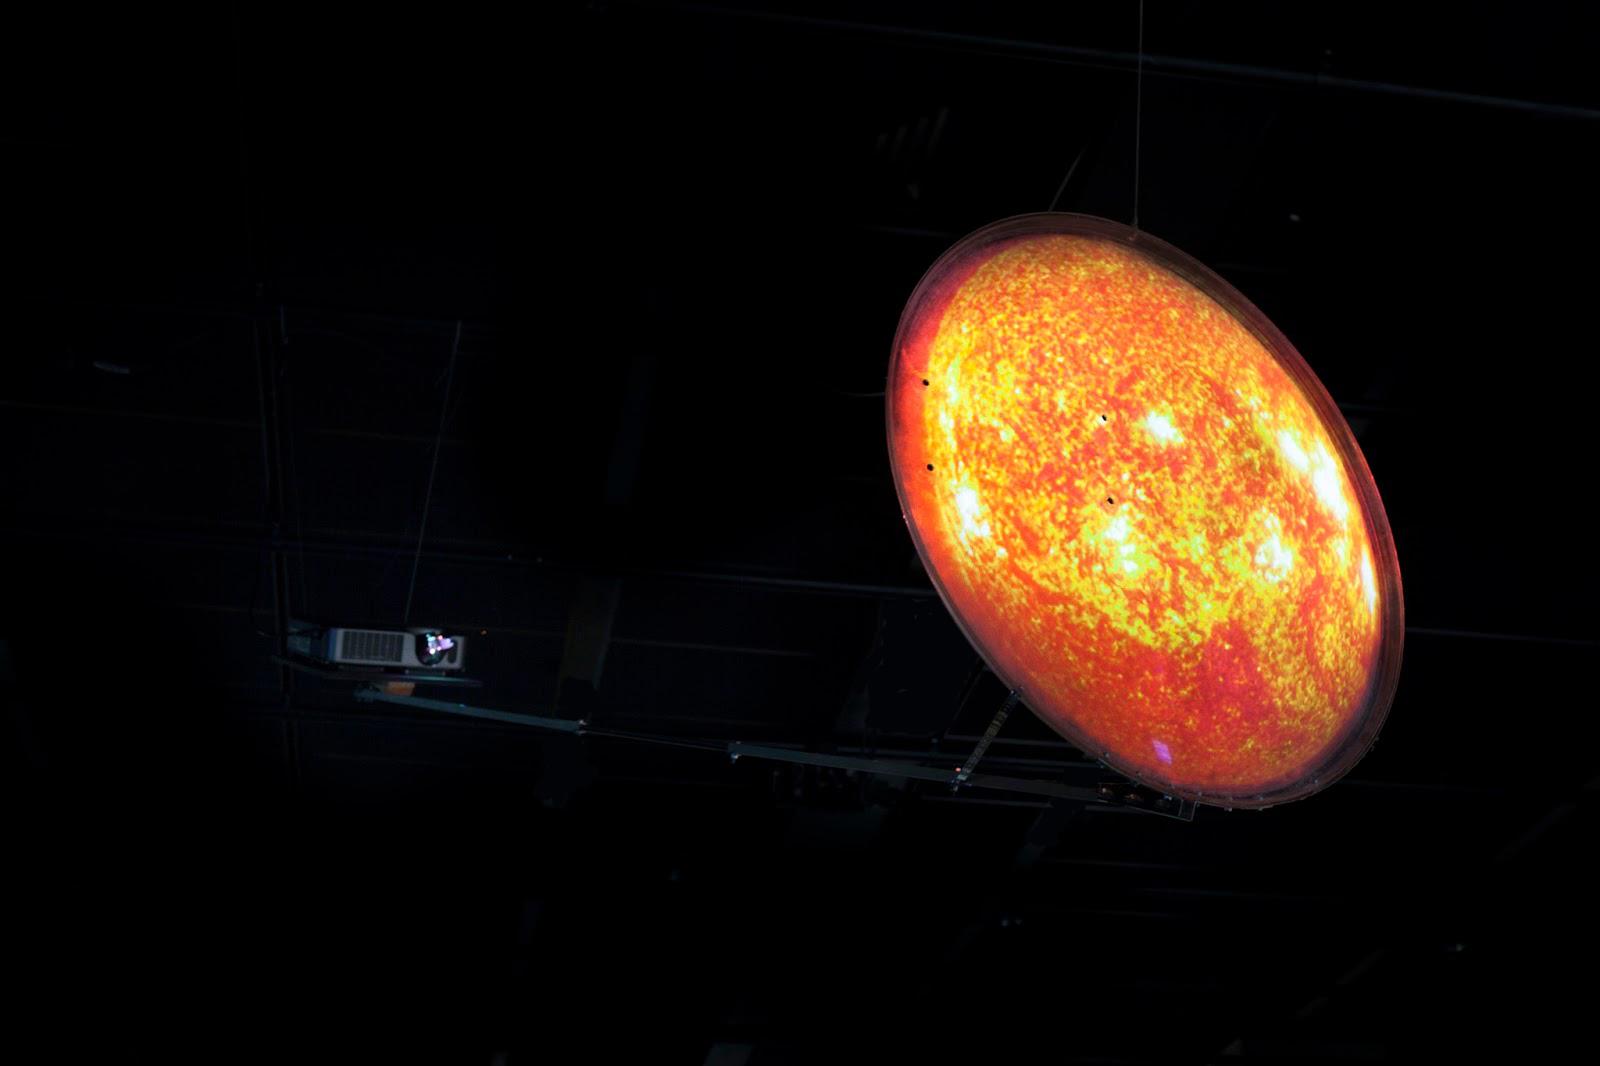 Sun Satellite Images - Reverse Search